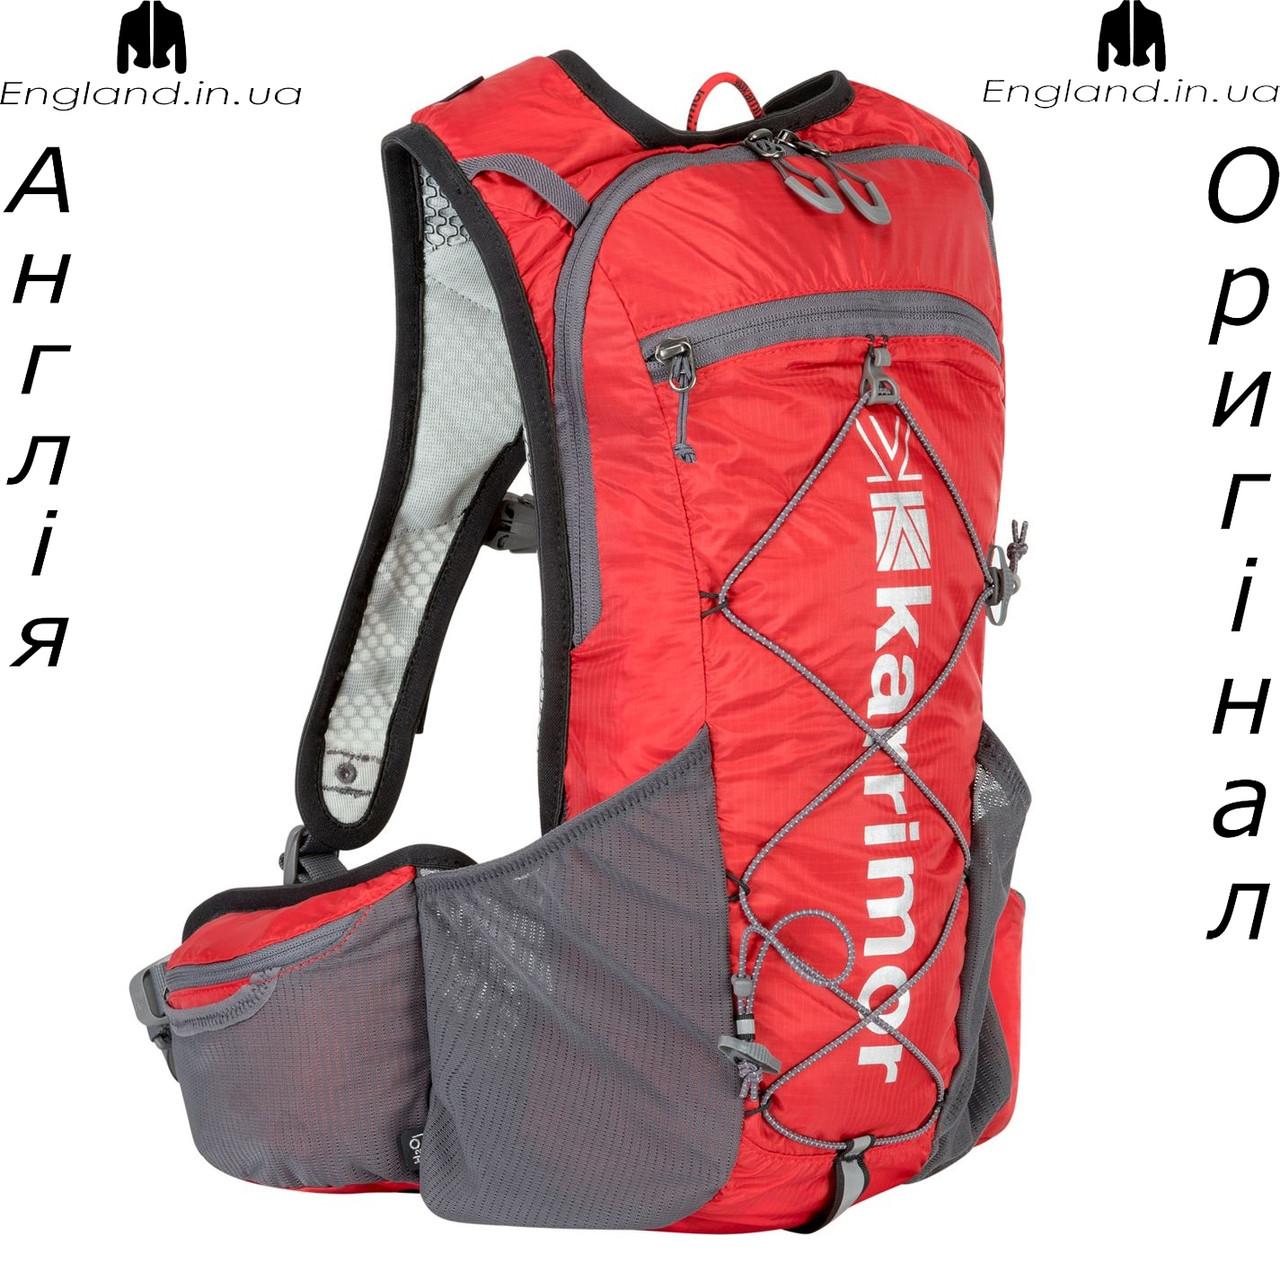 Рюкзак Karrimor из Англии - для бега